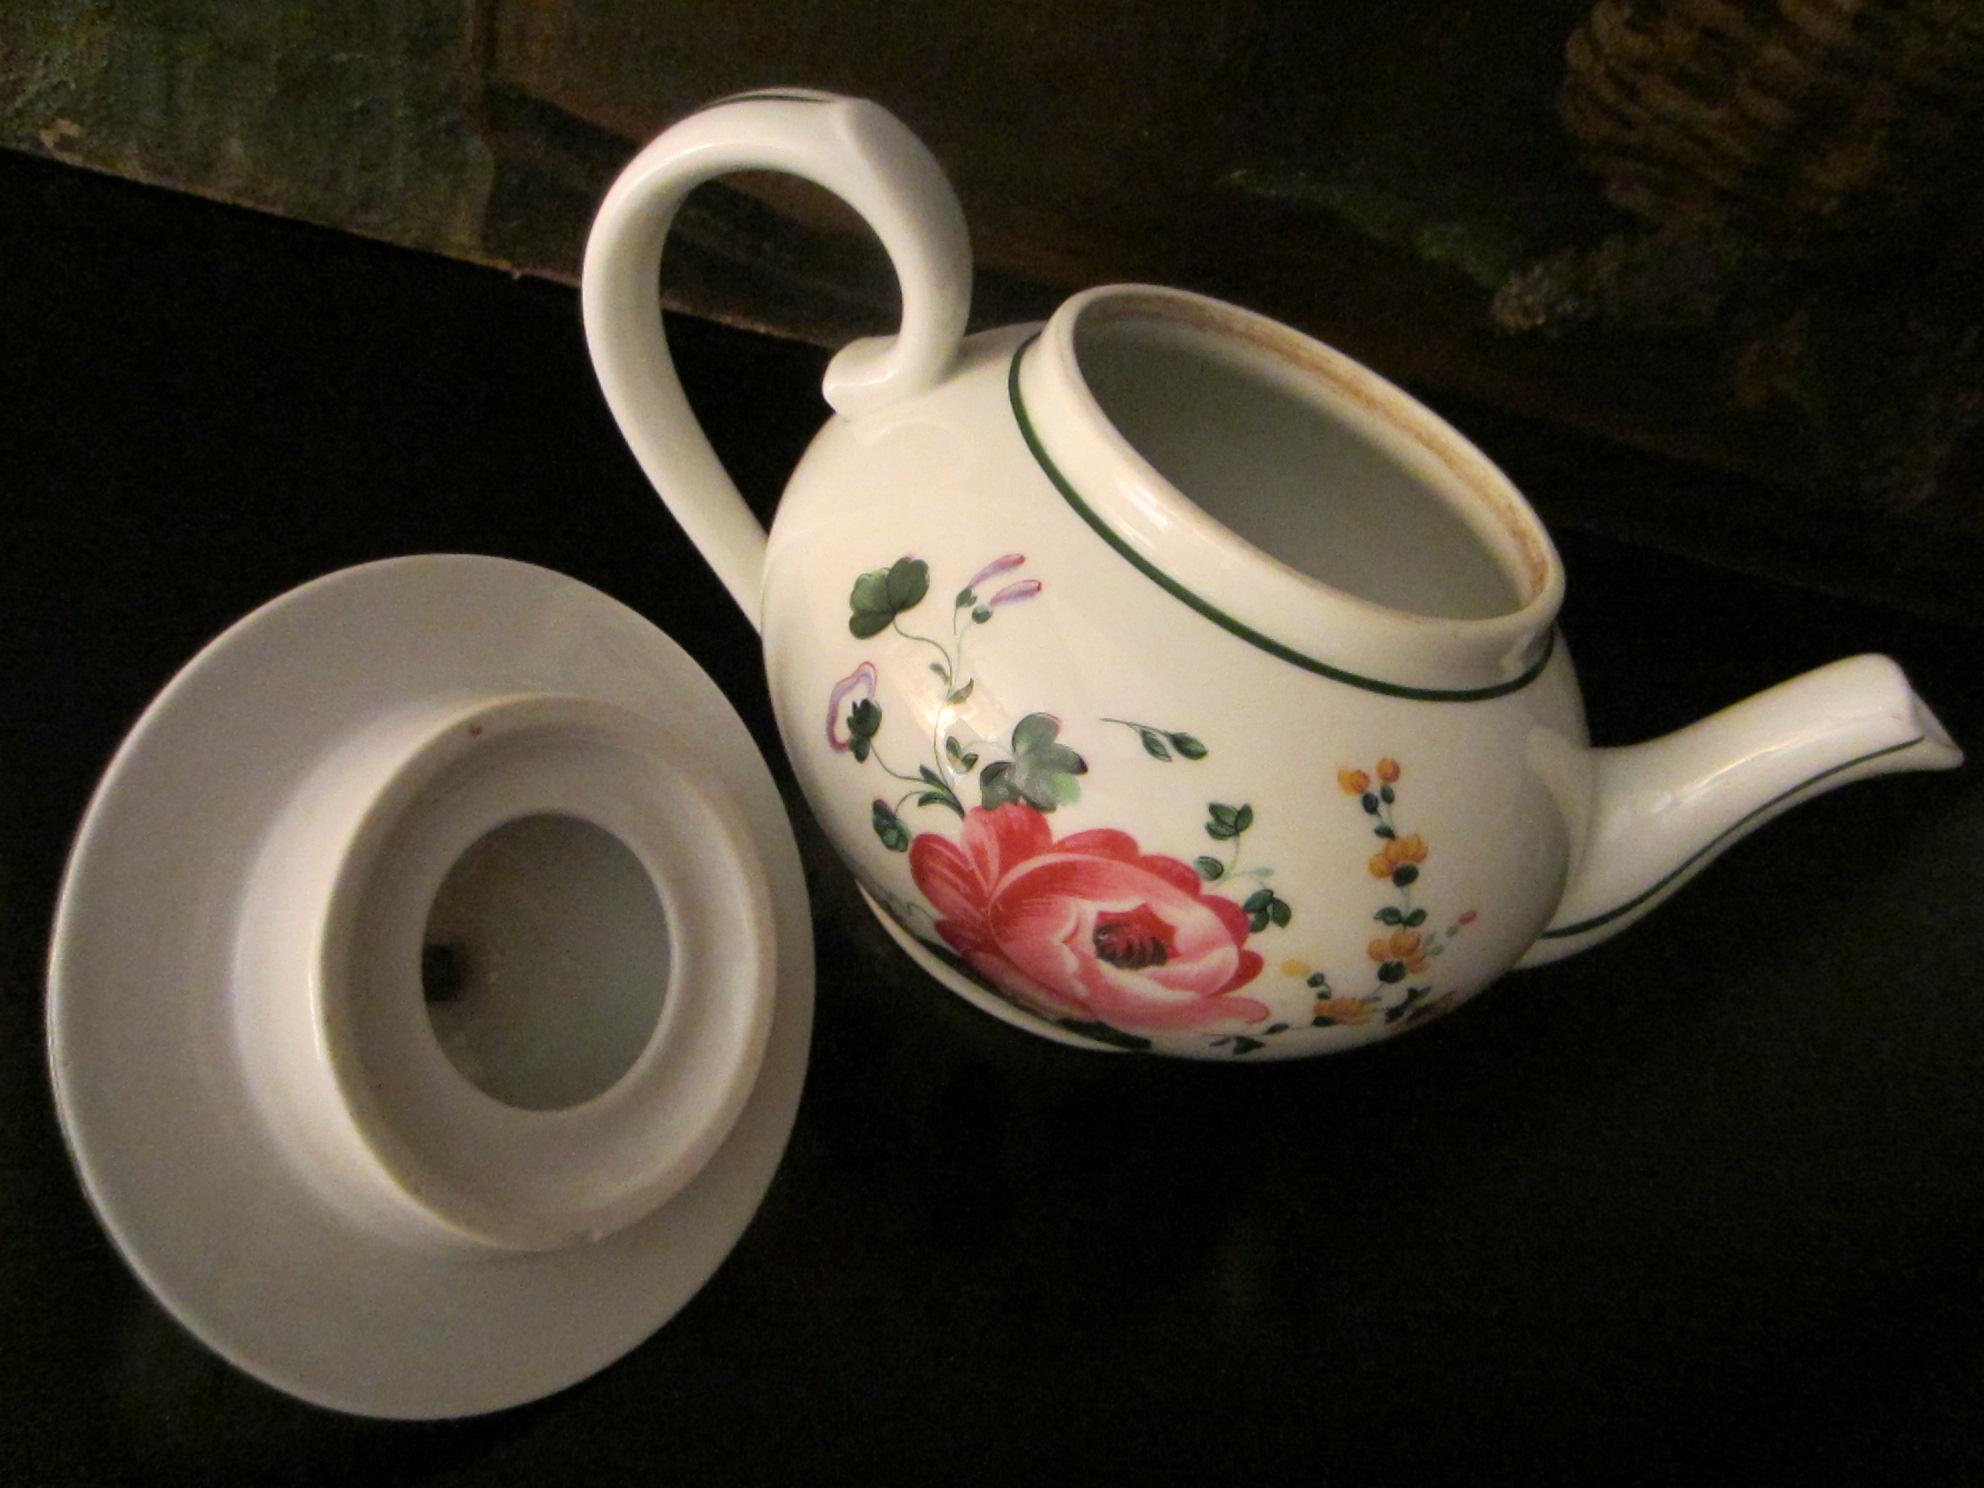 Apilco France Porcelain Floral Teapot Made For William Sonoma Grande